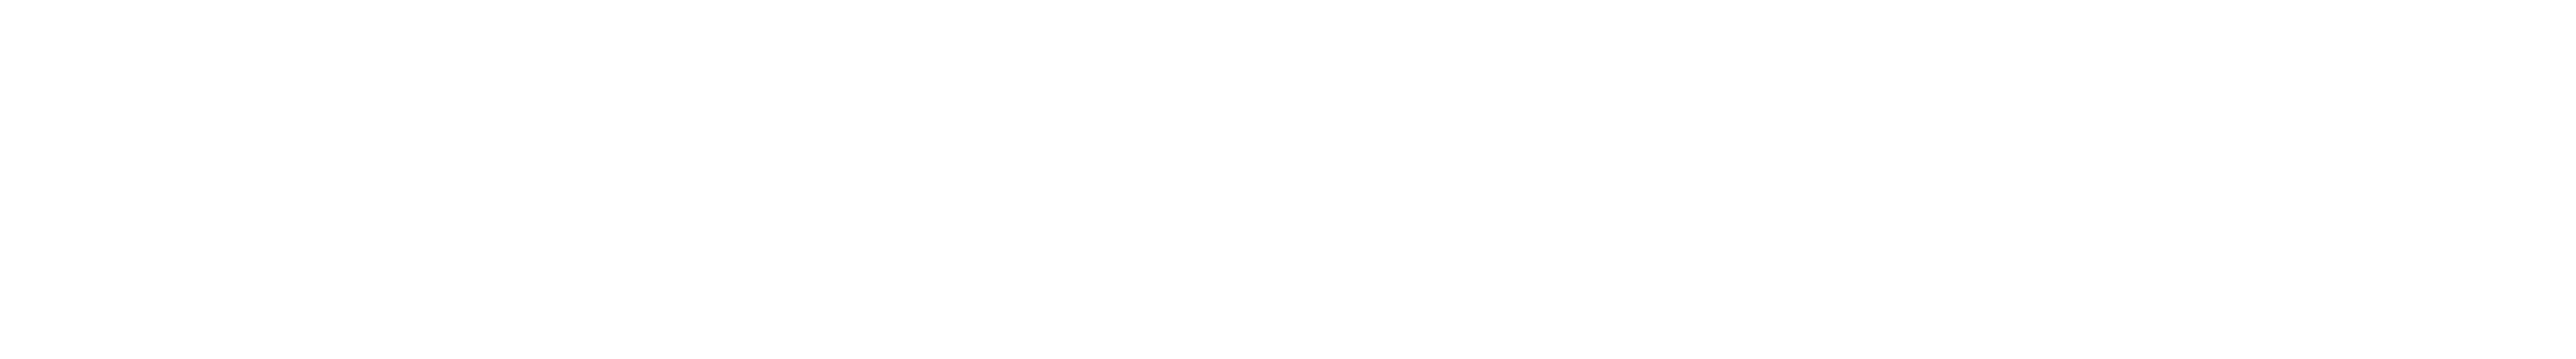 Legend-Kayaks---Kanaloa-Logo-White